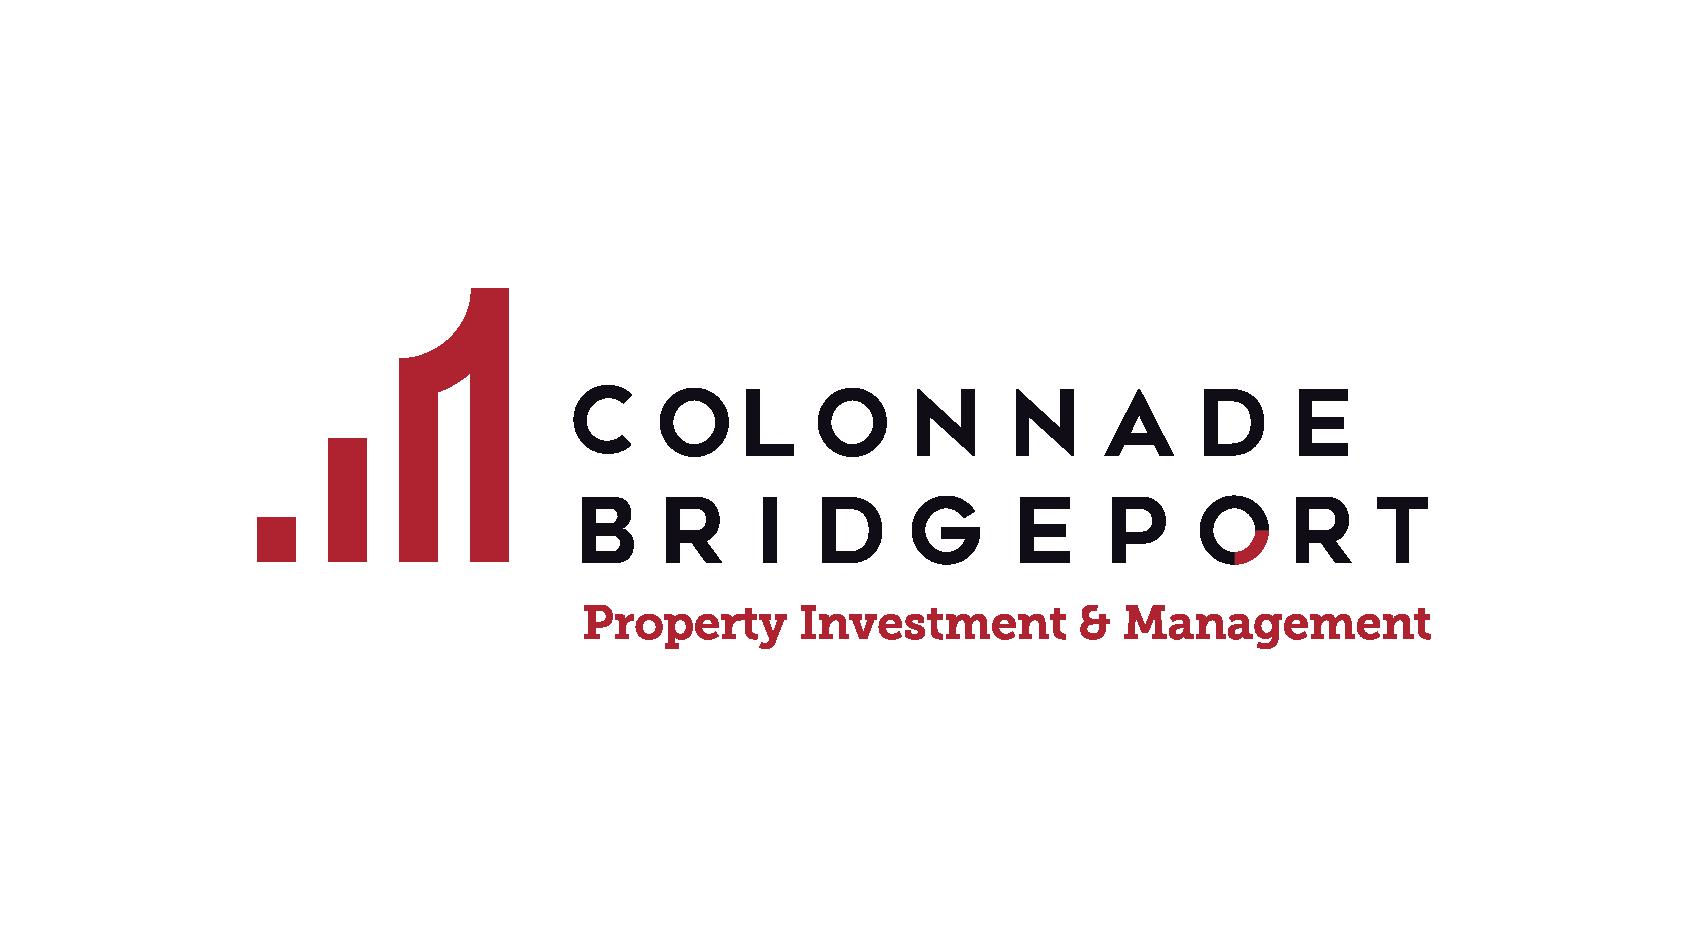 Five-Acre Mixed-Use Development Site Acquired in Ottawa